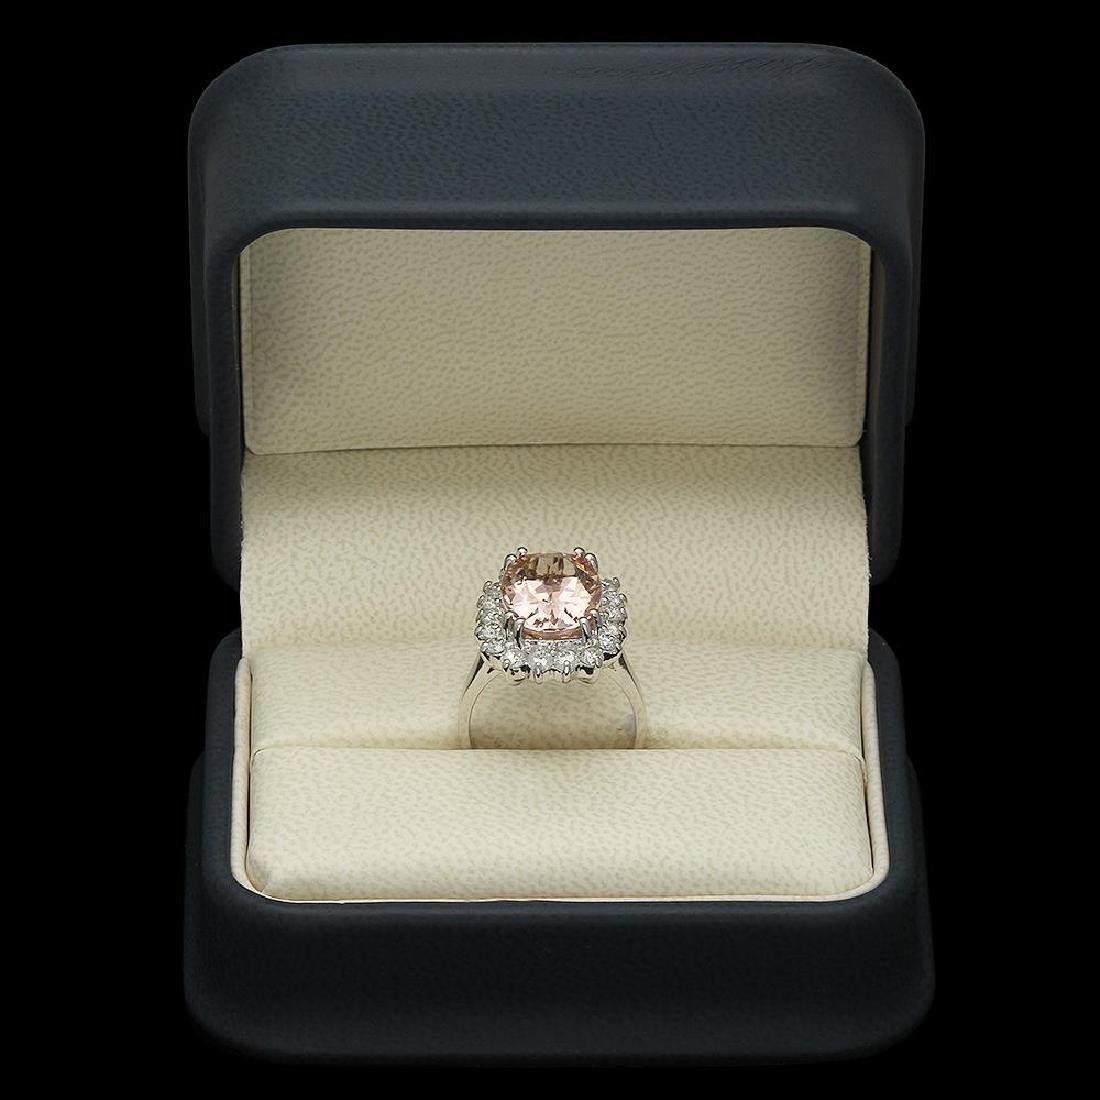 14K Gold 6.23ct Morganite 1.16ct Diamond Ring - 4